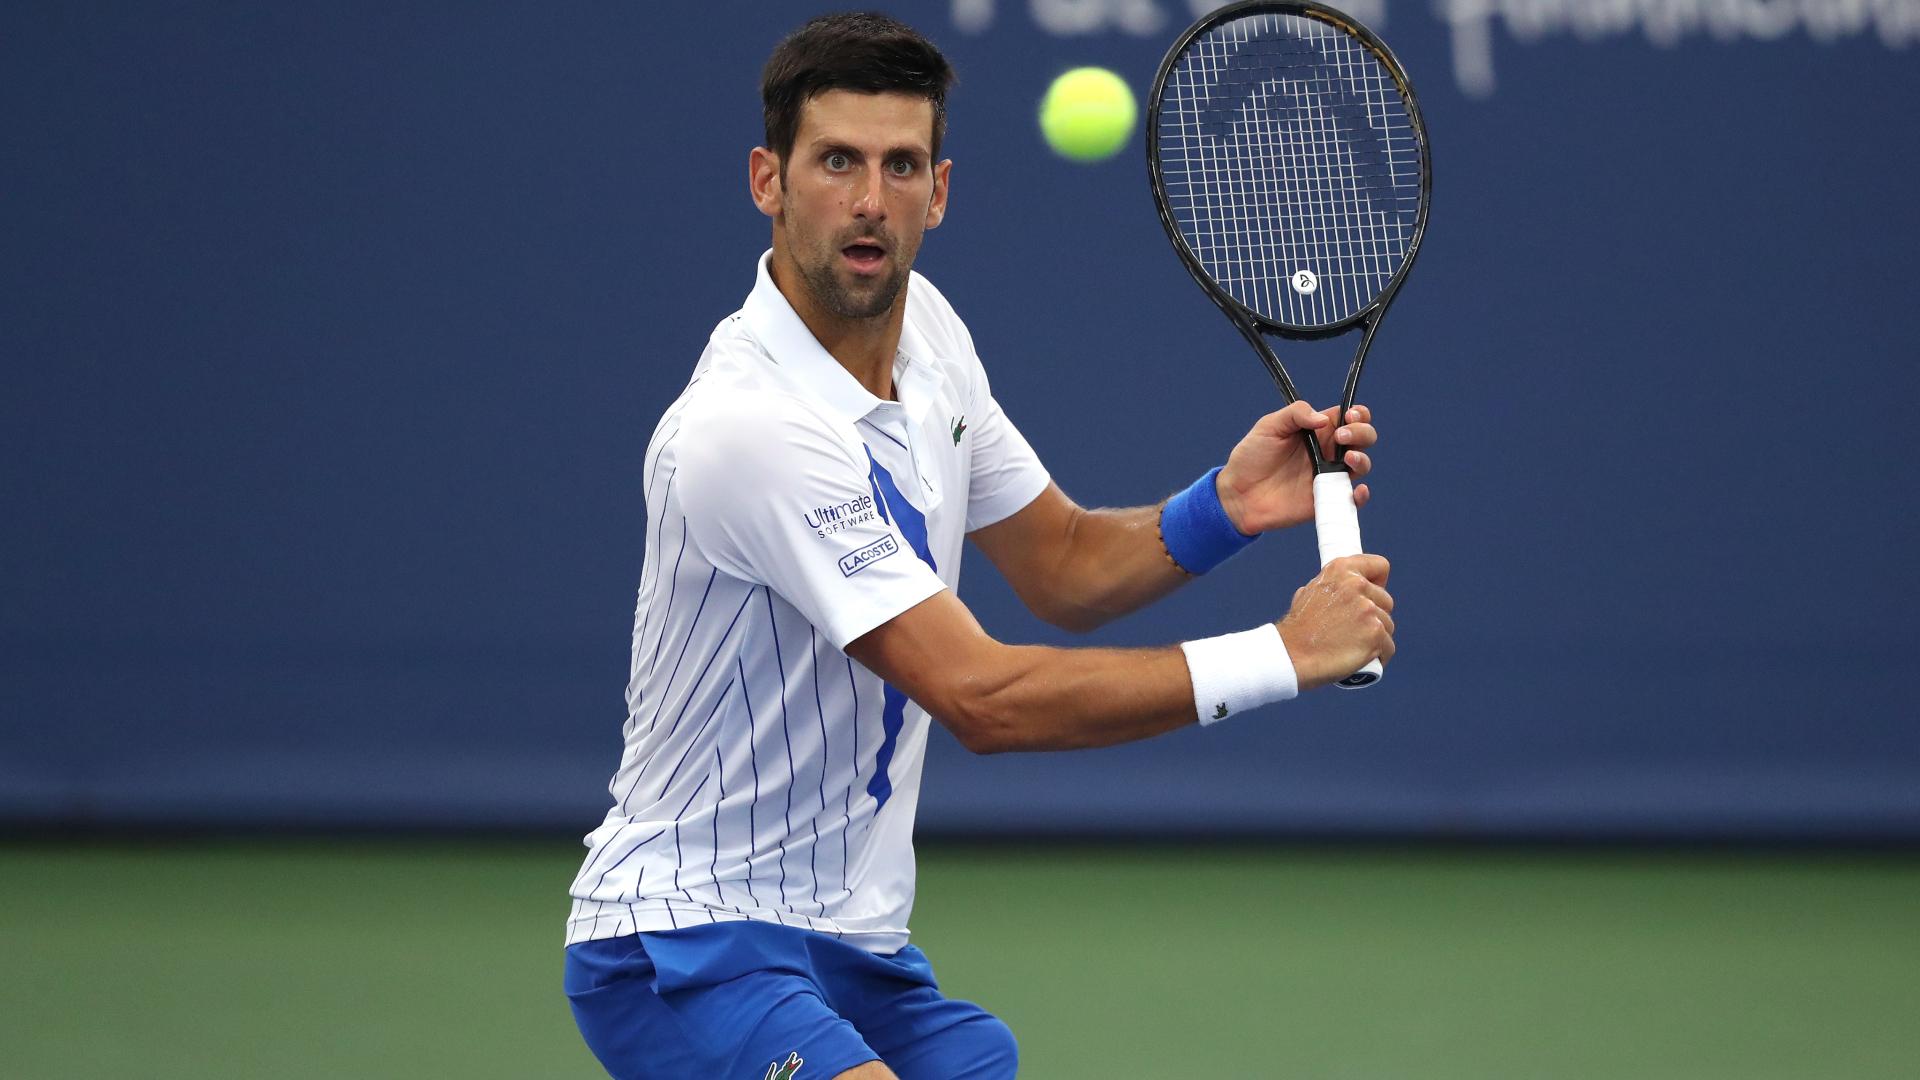 Us Open 2020 Novak Djokovic Eases Past Damir Dzumhur In First Round Sporting News Australia